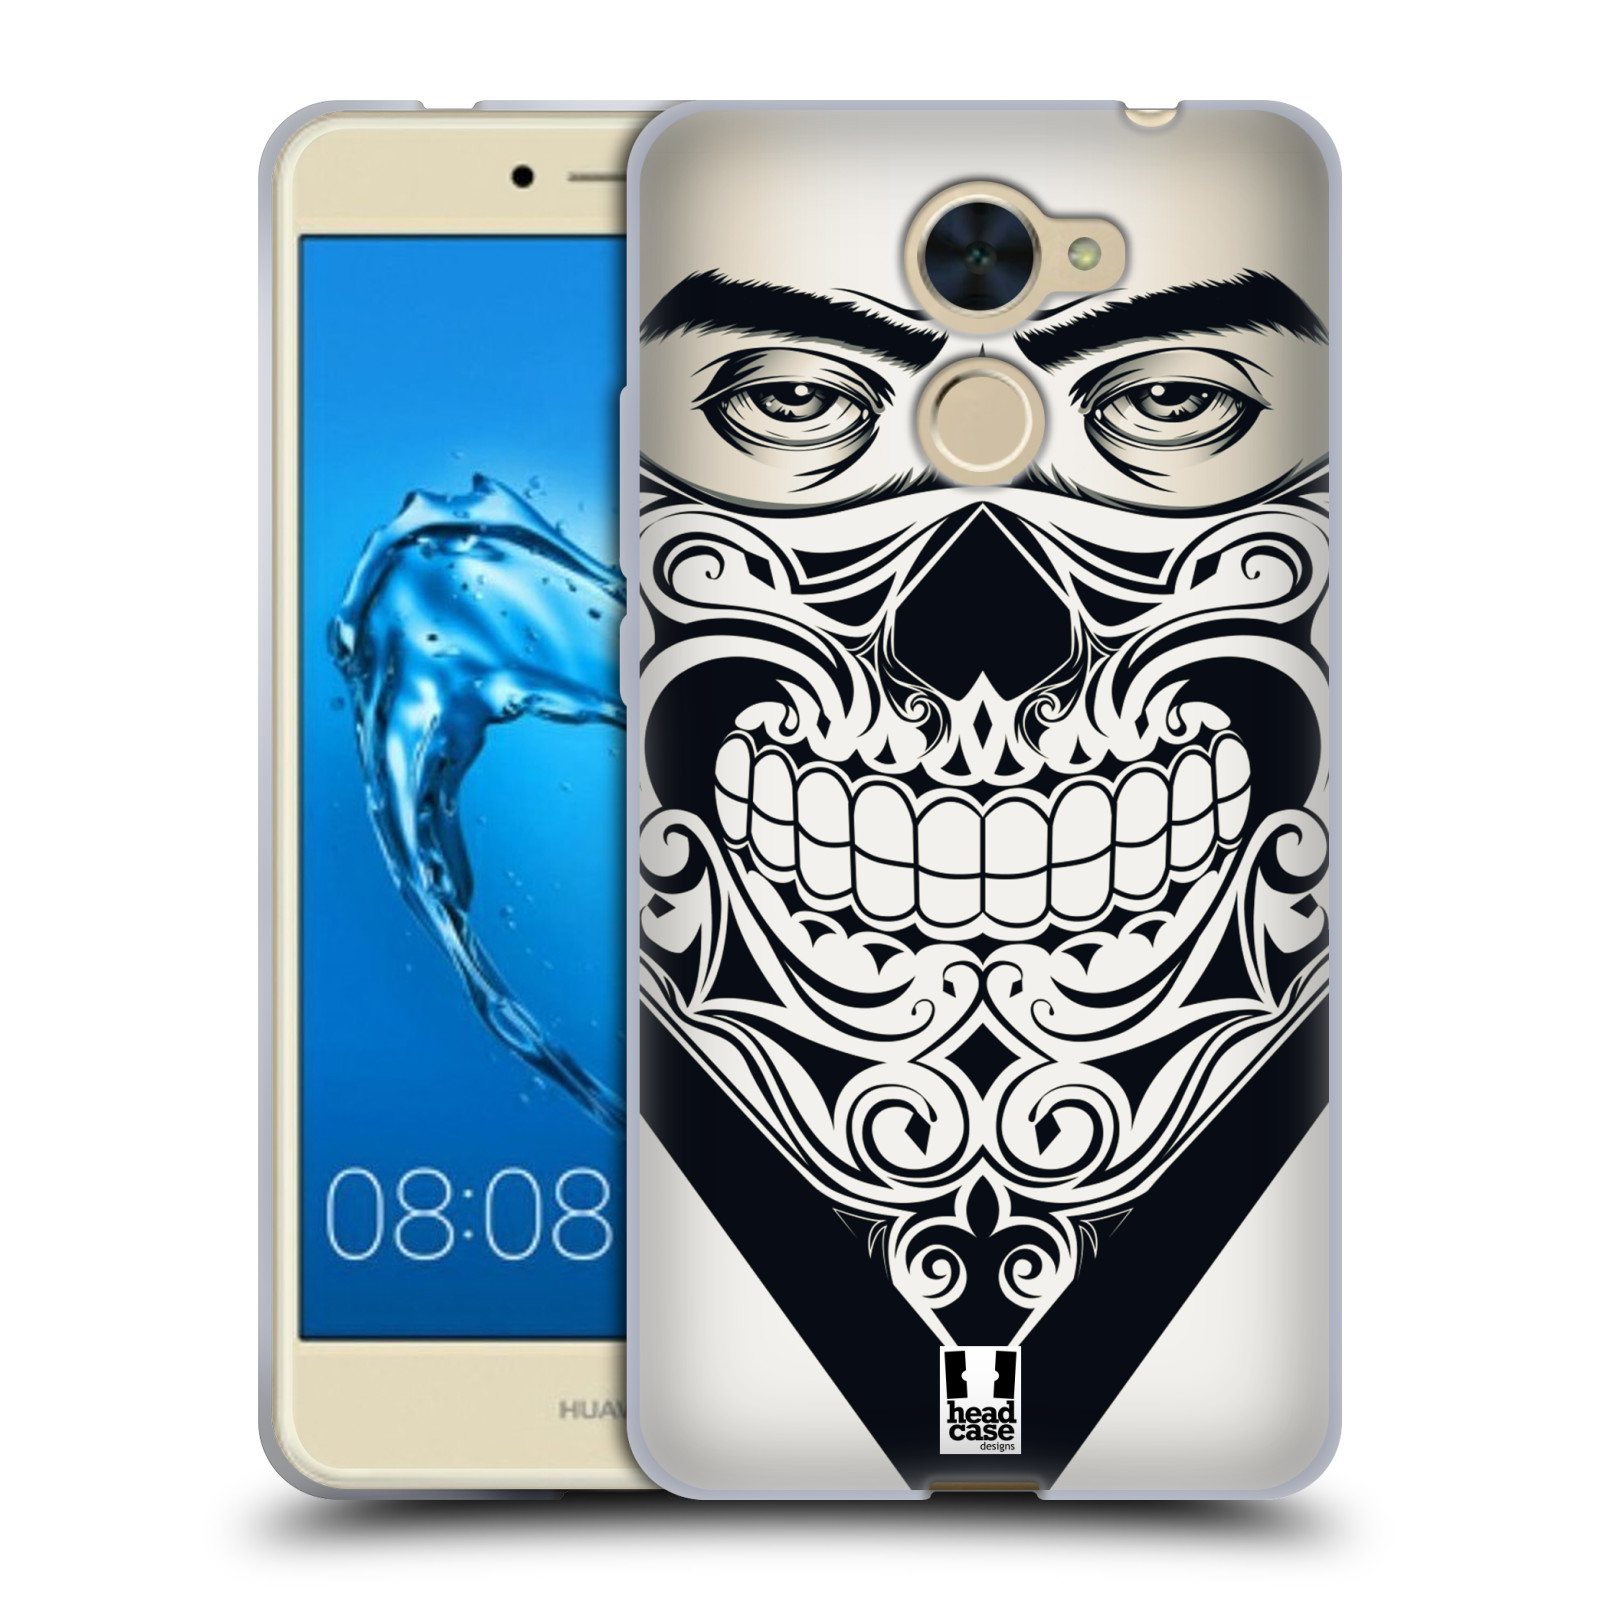 Silikonové pouzdro na mobil Huawei Y7 - Head Case - LEBKA BANDANA